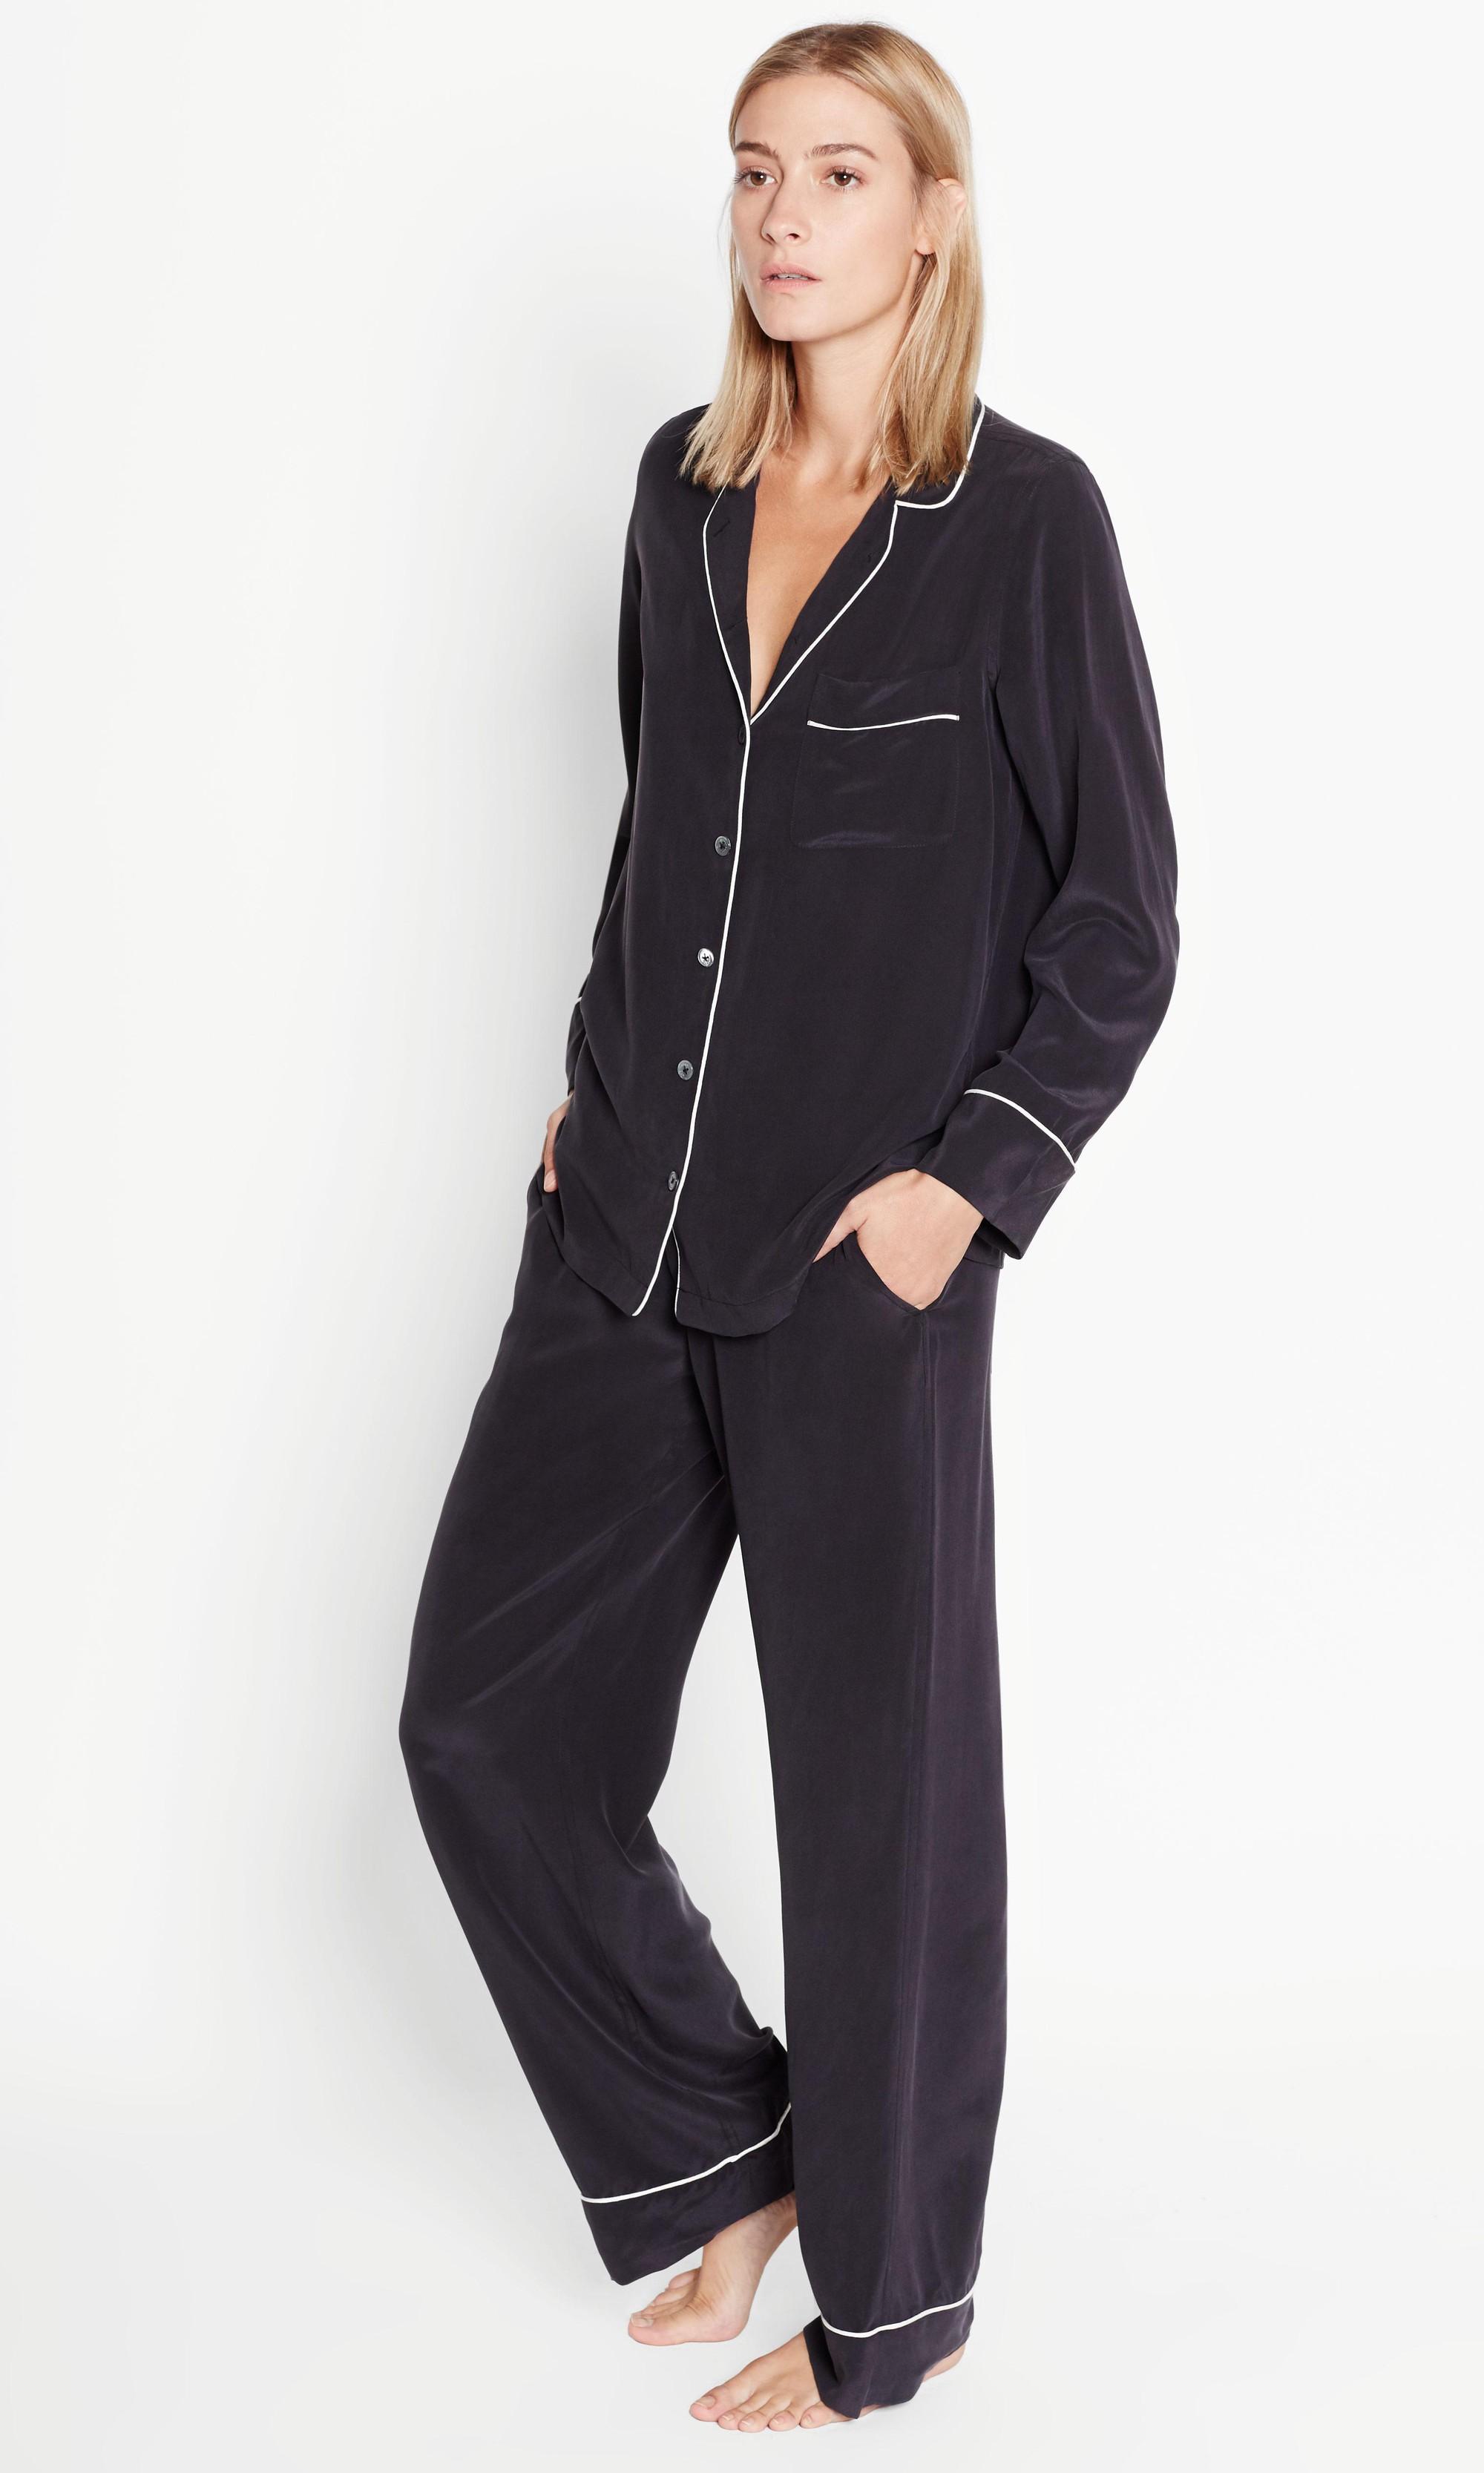 54dcb469c1 Lyst - Equipment Avery Pajama Set in Black